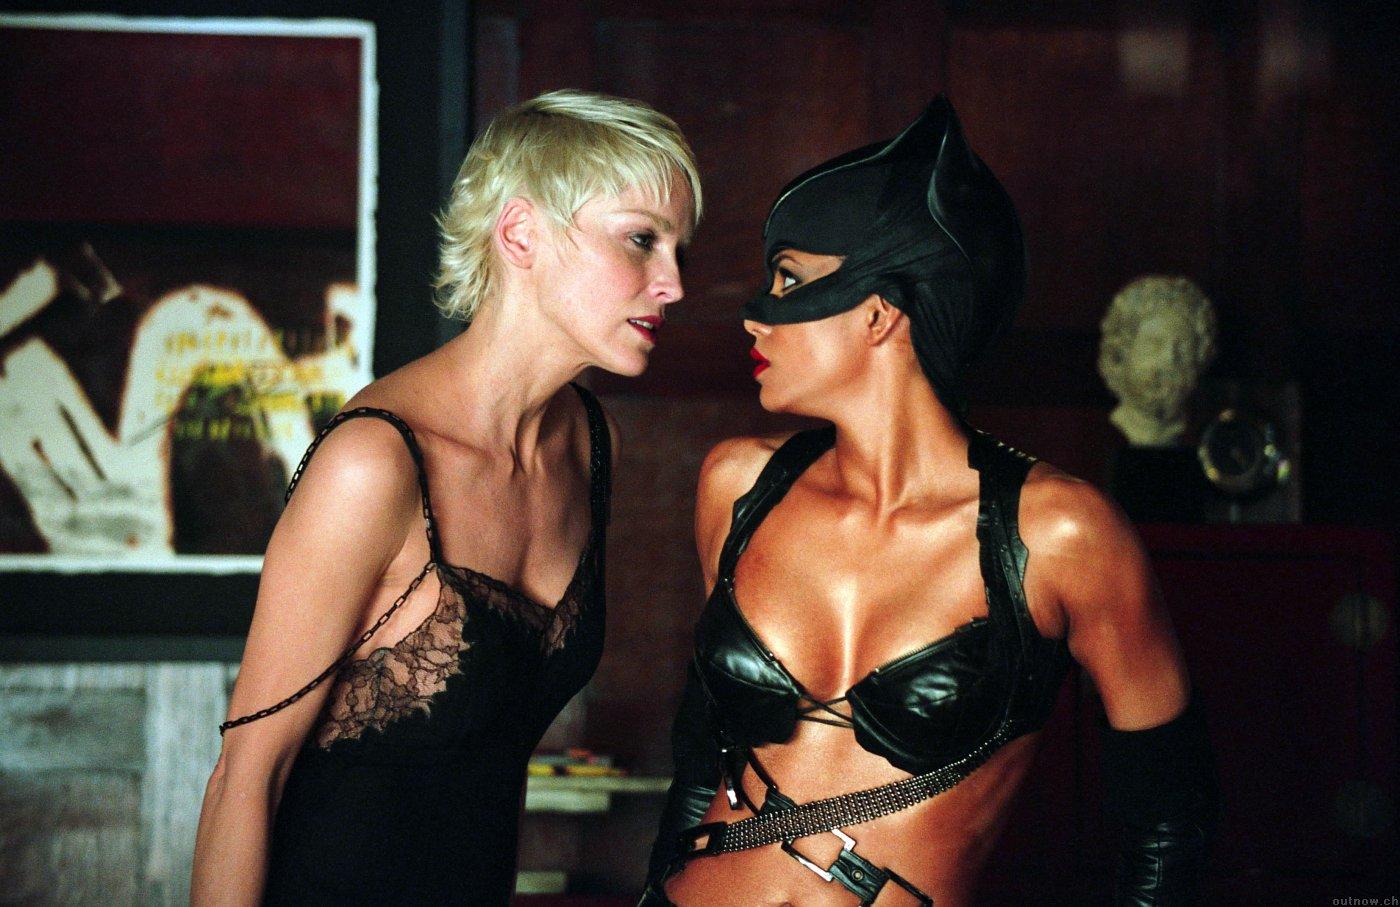 https://i0.wp.com/manapop.com/wp-content/uploads/2014/09/Catwoman-Image-16.jpg